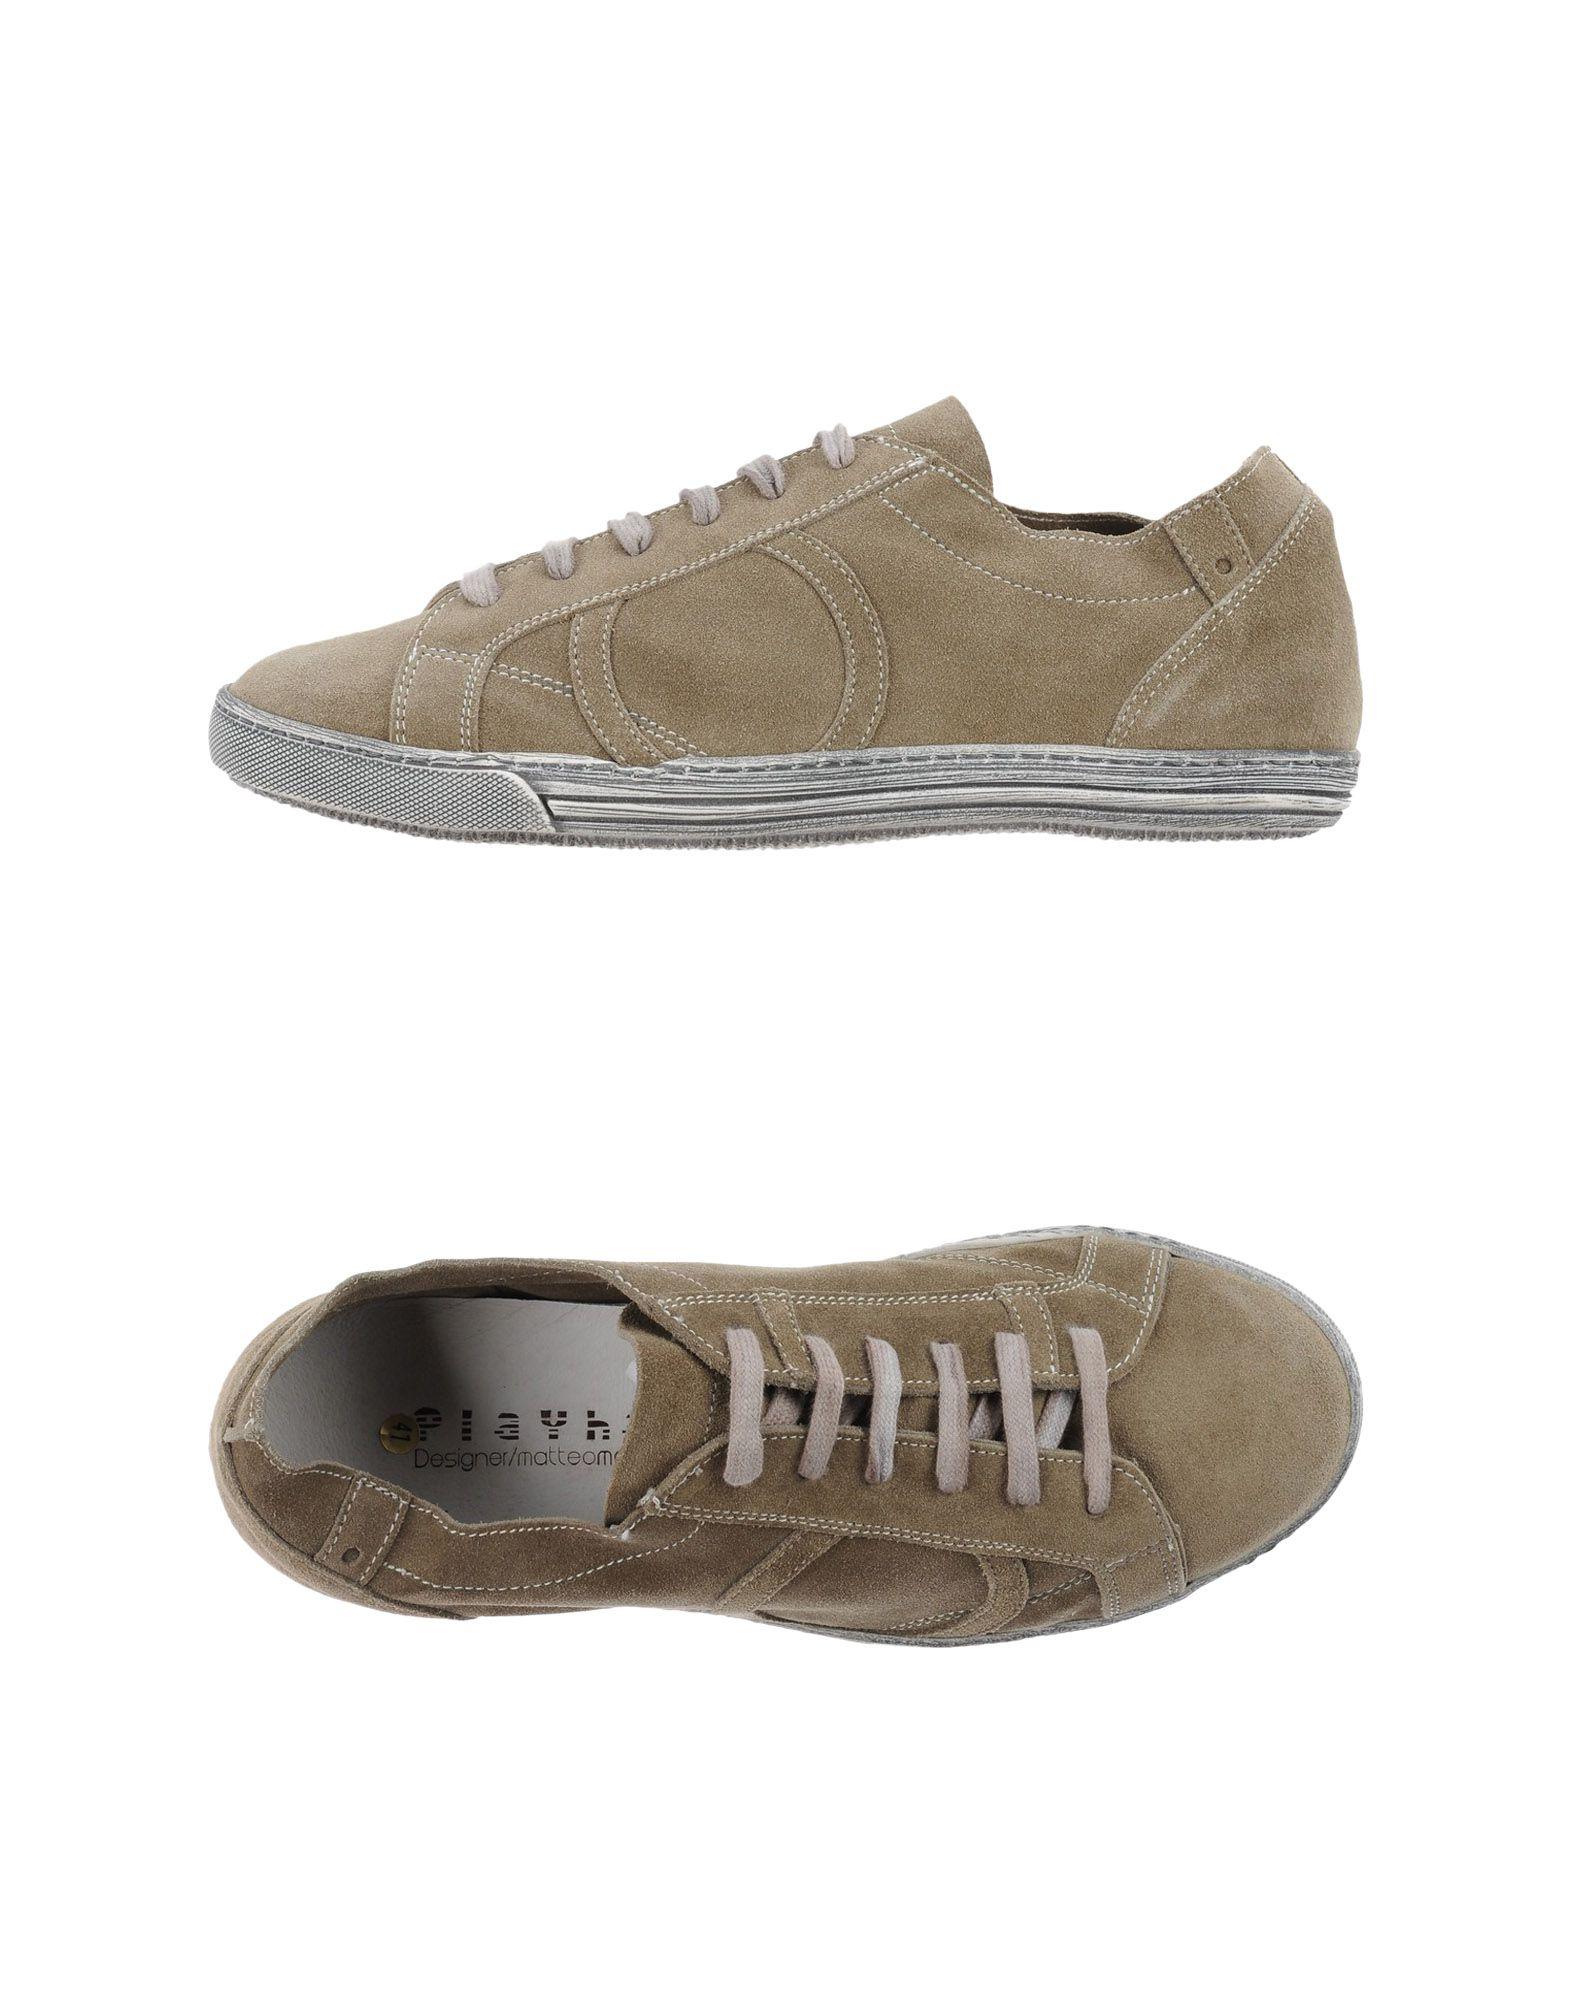 A buon mercato Sneakers Playhat Uomo - 44859519TA